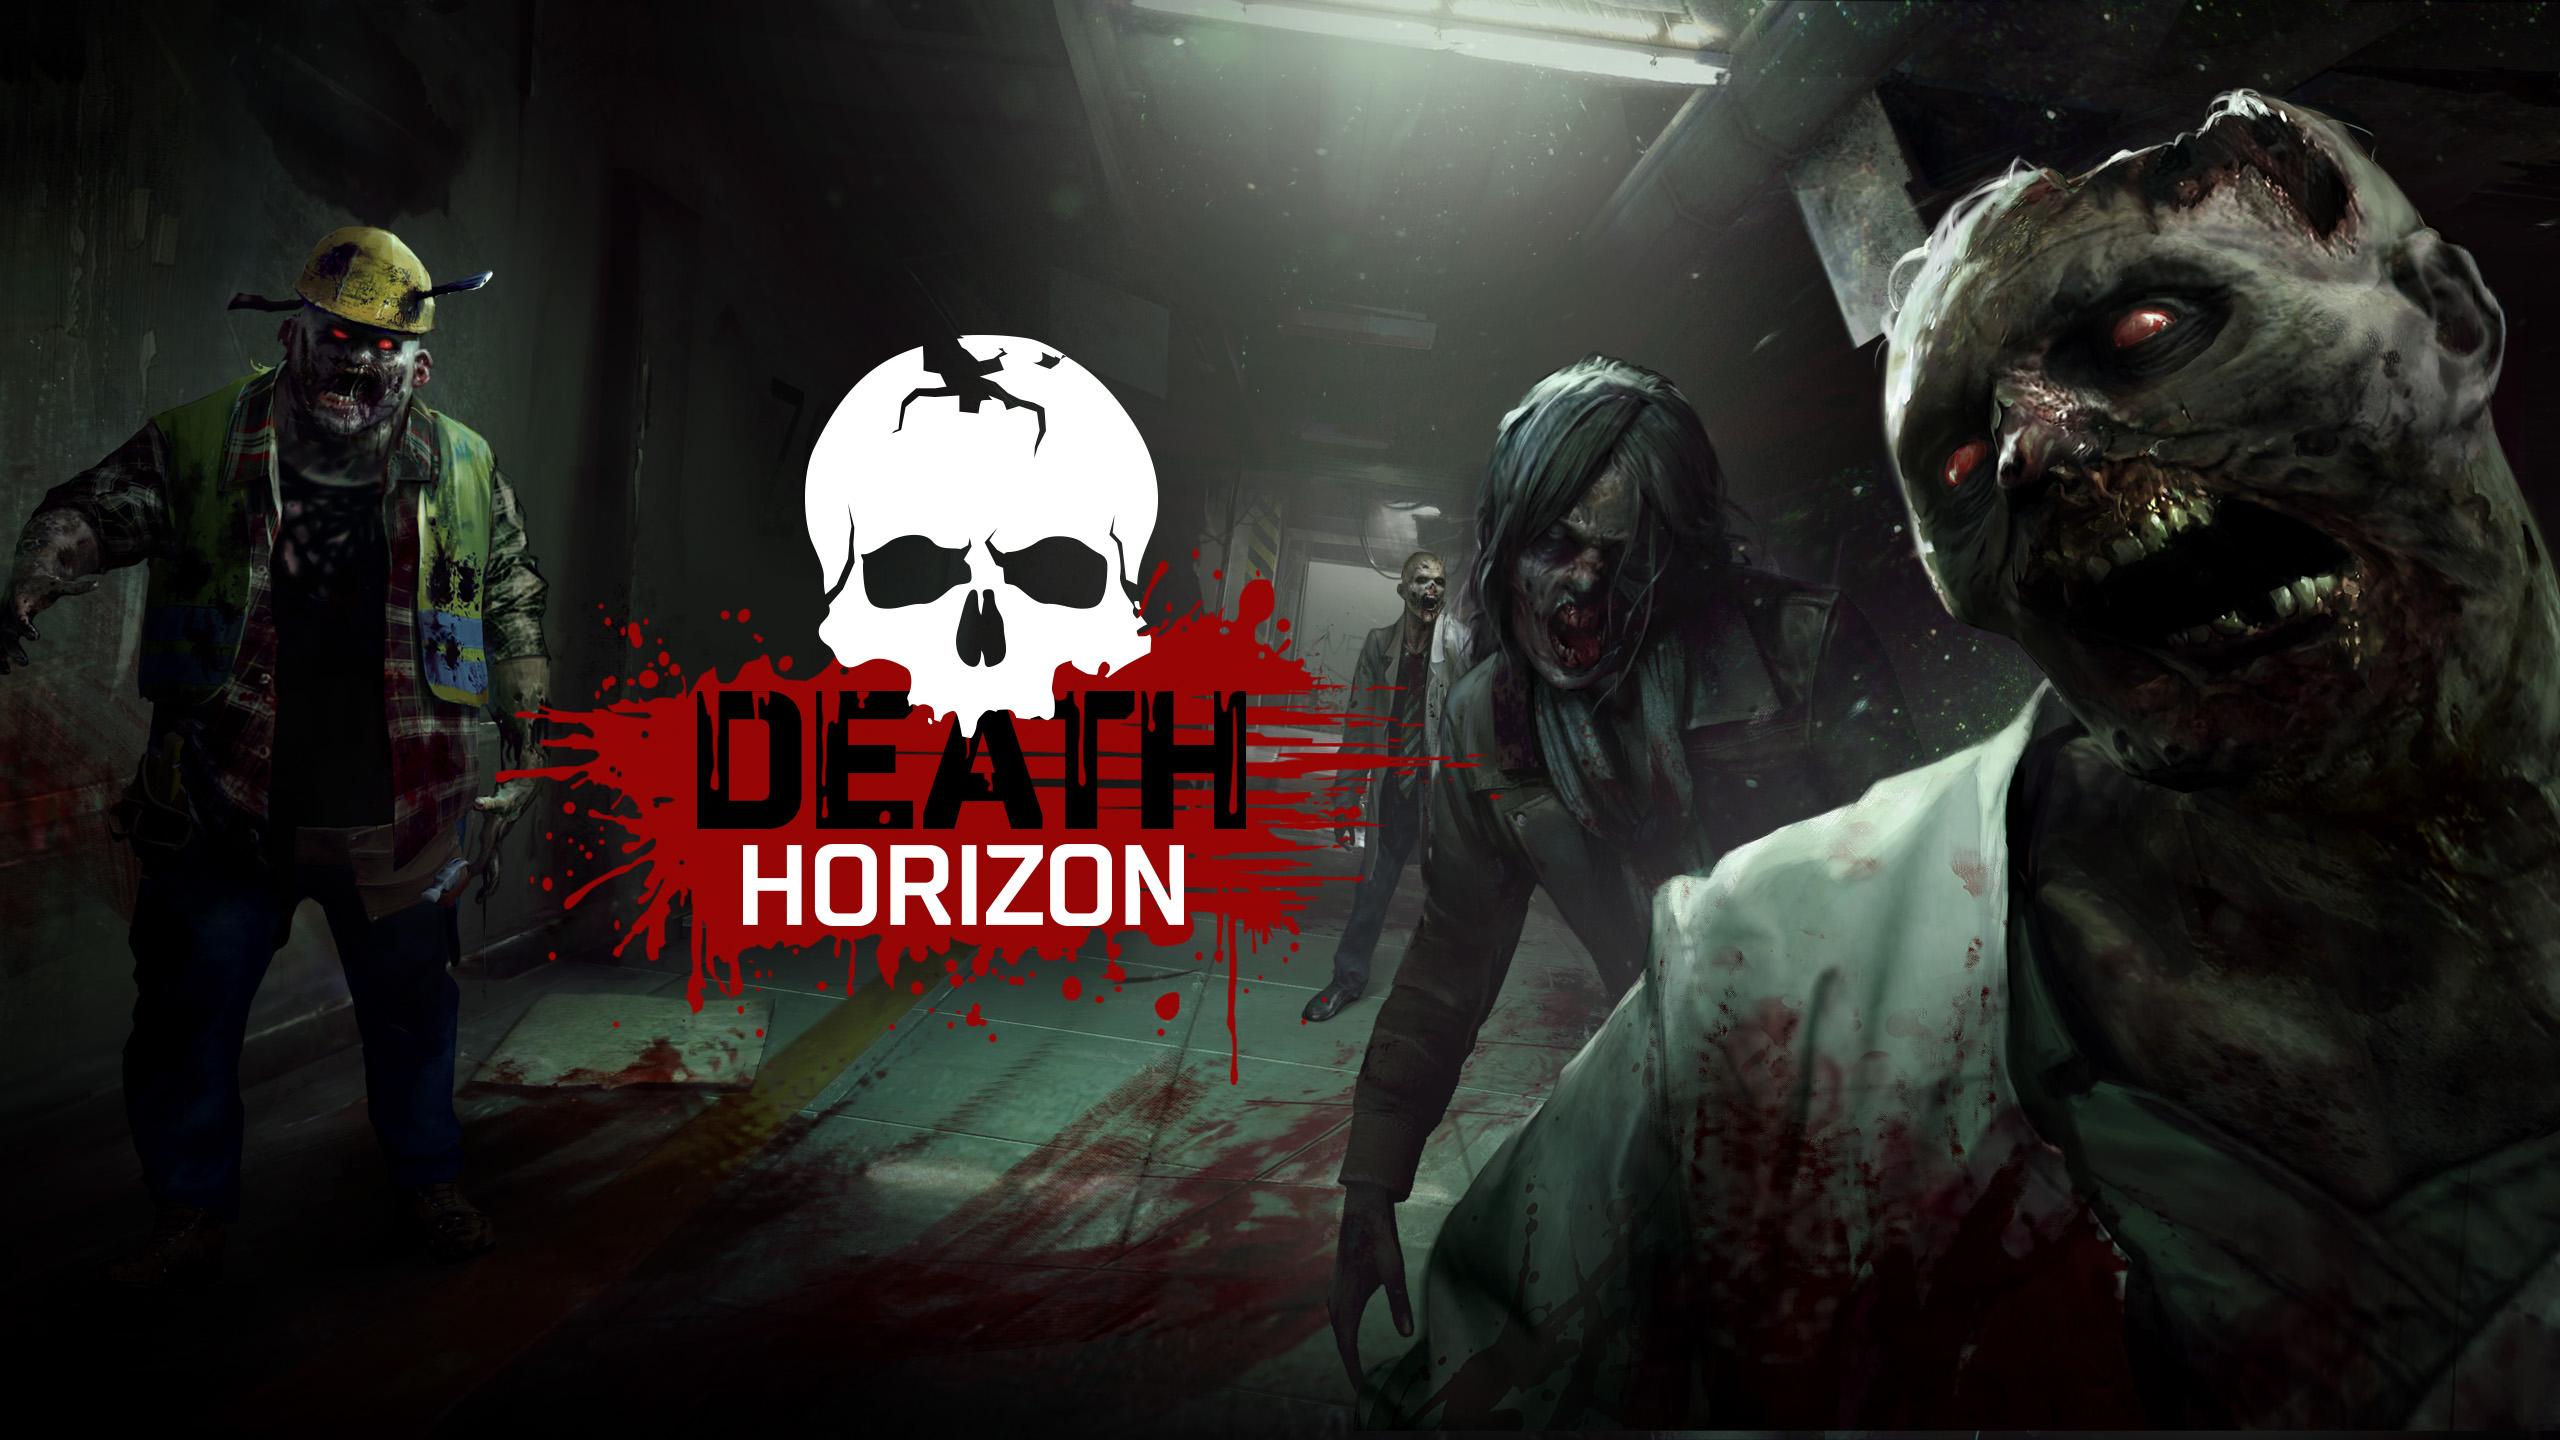 DEATH HORIZON VR에 대한 이미지 검색결과